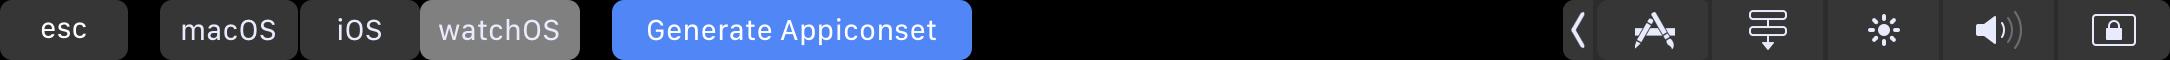 appiconset-generator-touchbar